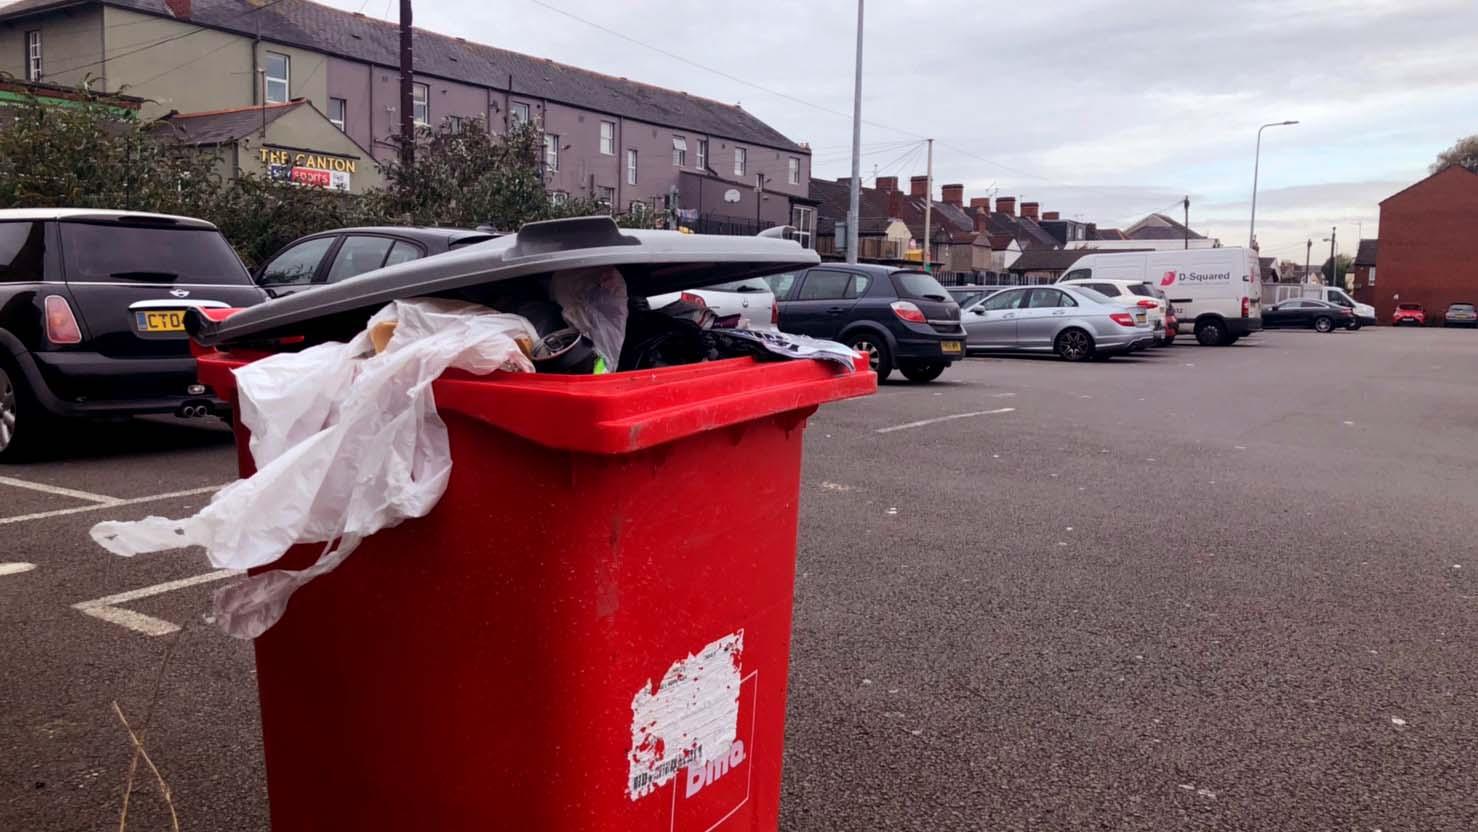 an overloaded bin in the car park